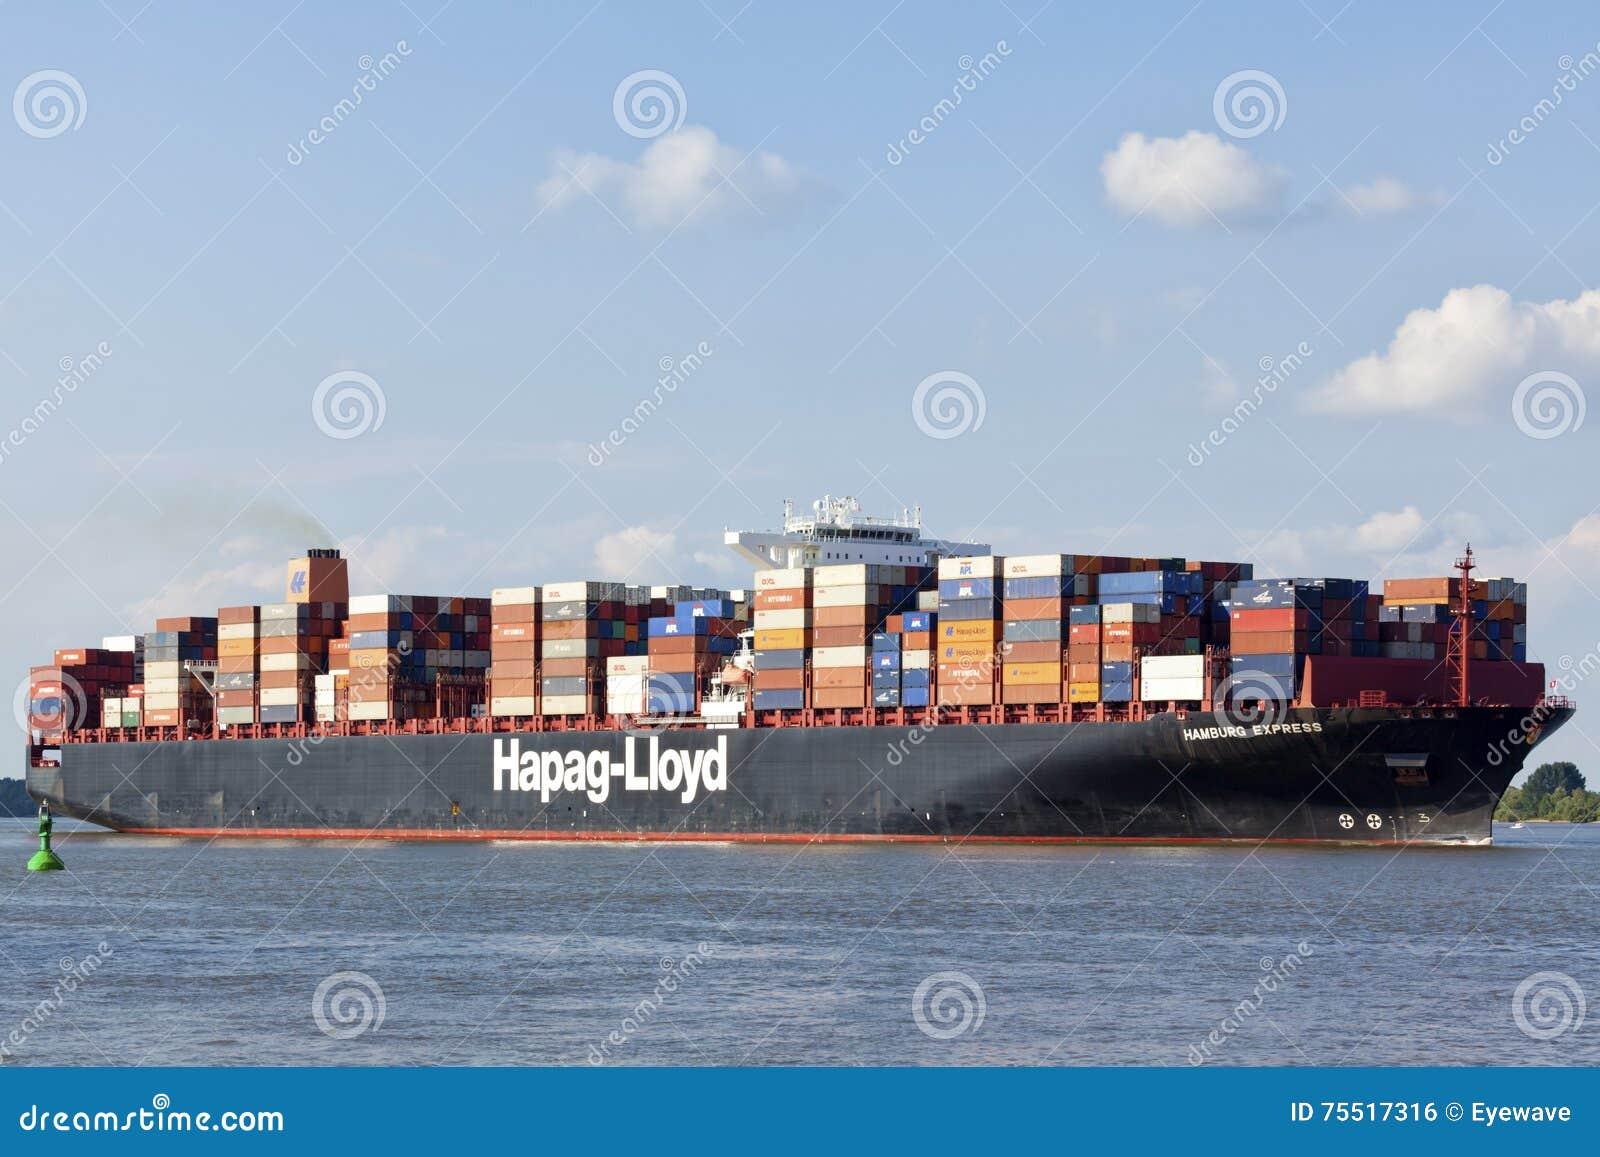 Container Ship Hamburg Express Editorial Photo - Image of